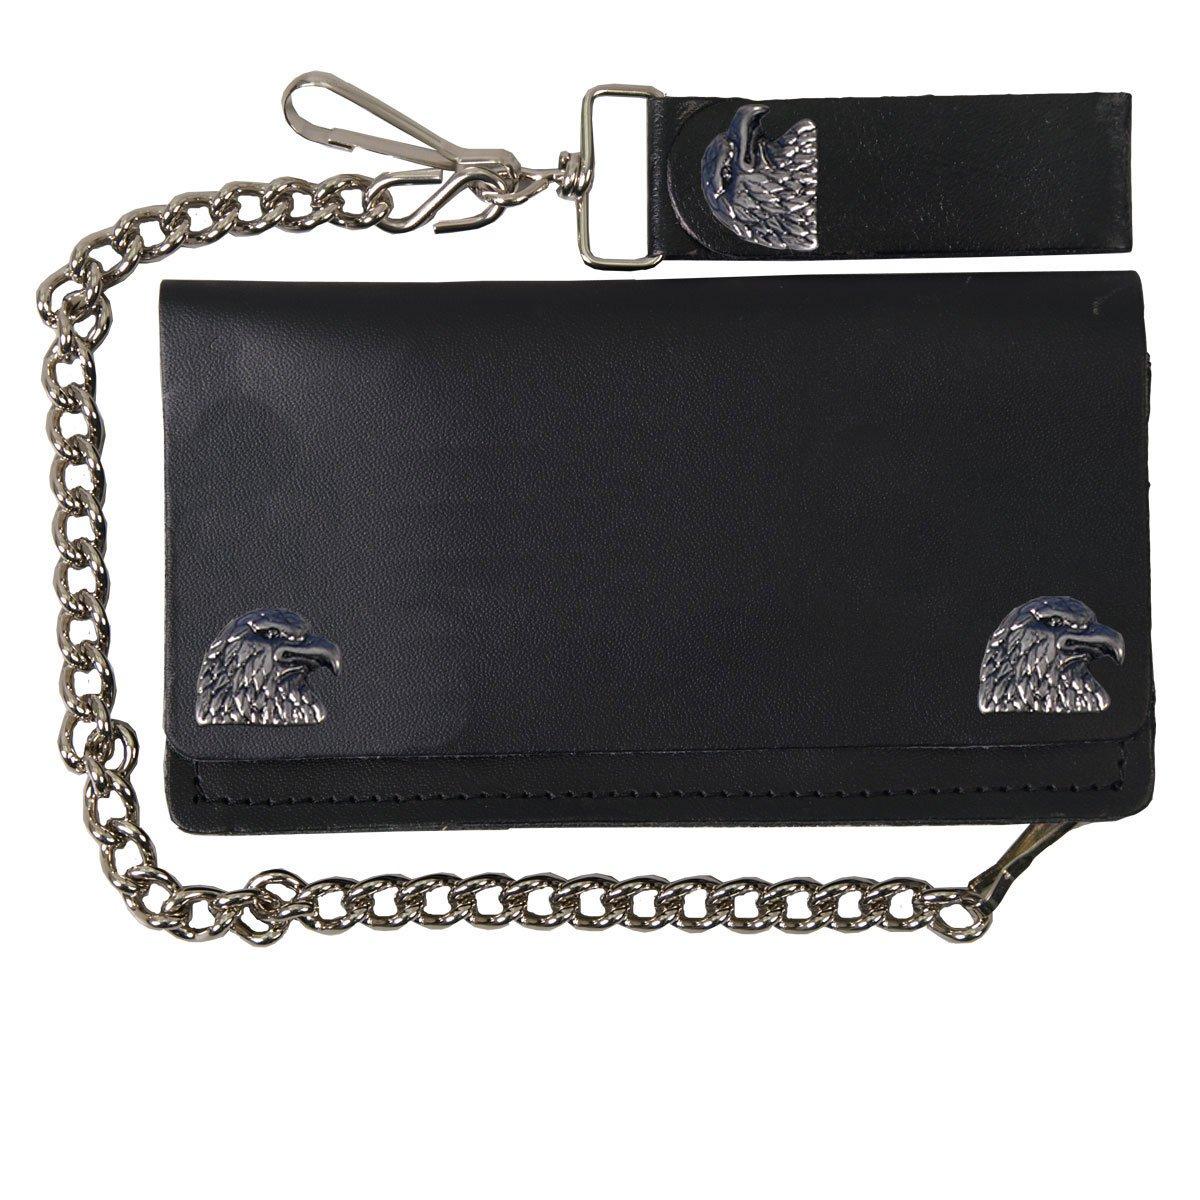 Eagle Leather Wallet WLA2007 BLACK, 6 Hot Leathers